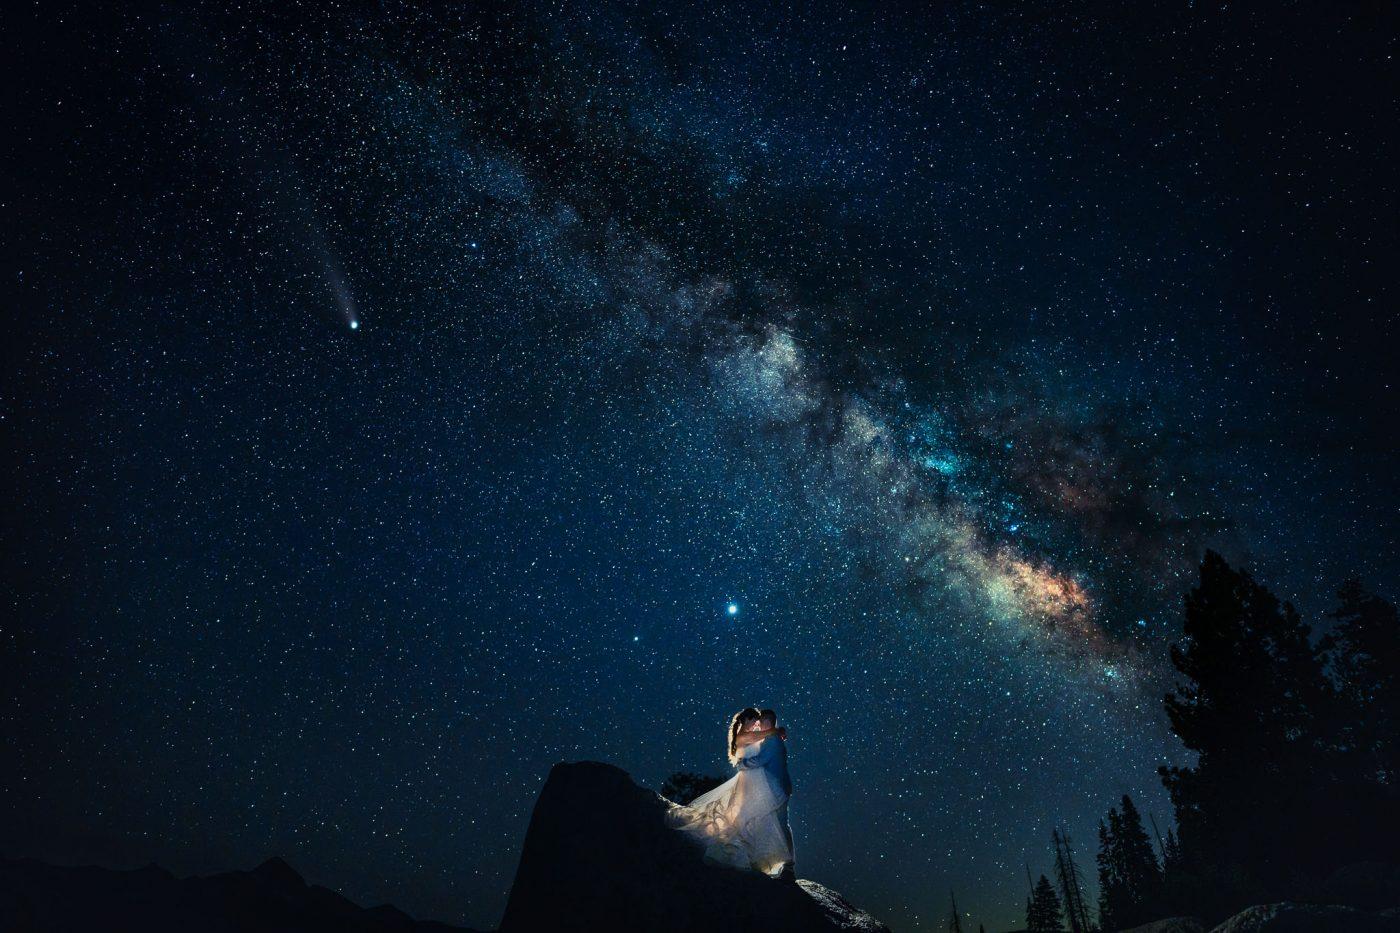 milky way galaxy stars wedding photo by photographer charleton churchill